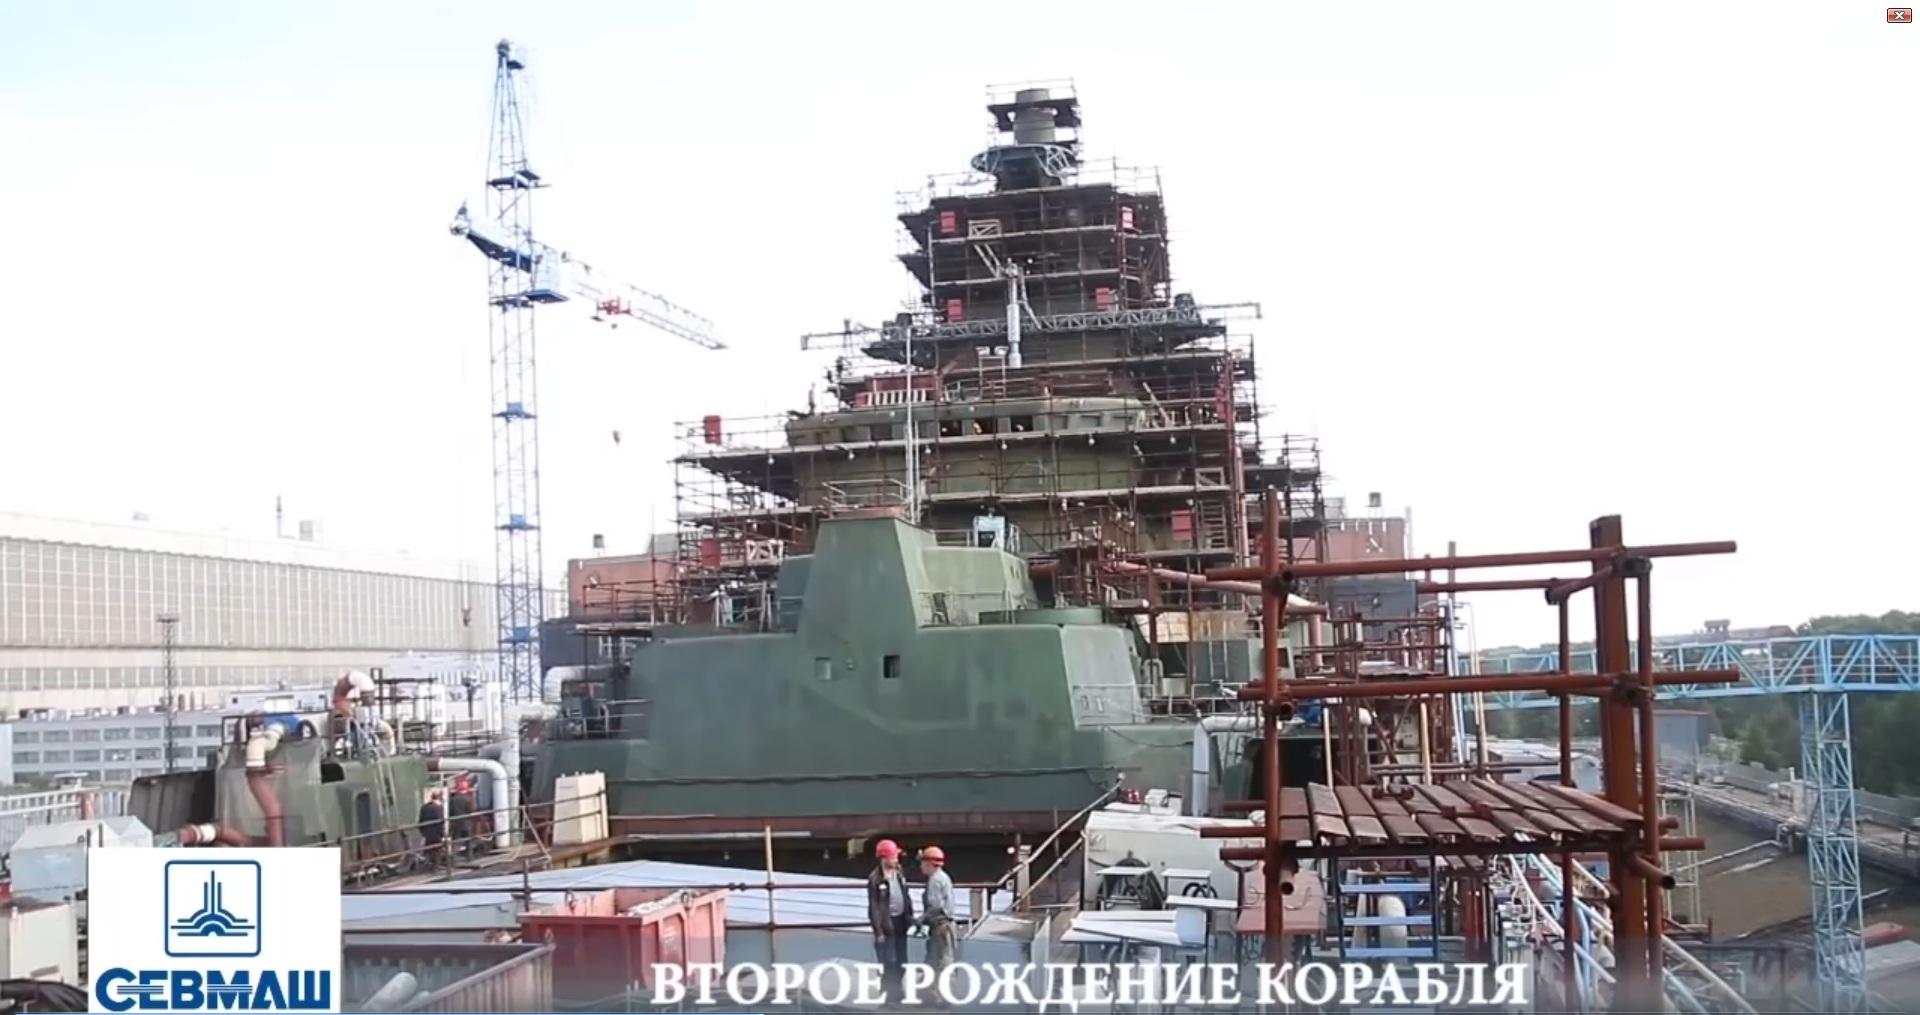 Upgraded Kirov class: Project 11442 [Admiral Nakhimov] - Page 13 1144njn